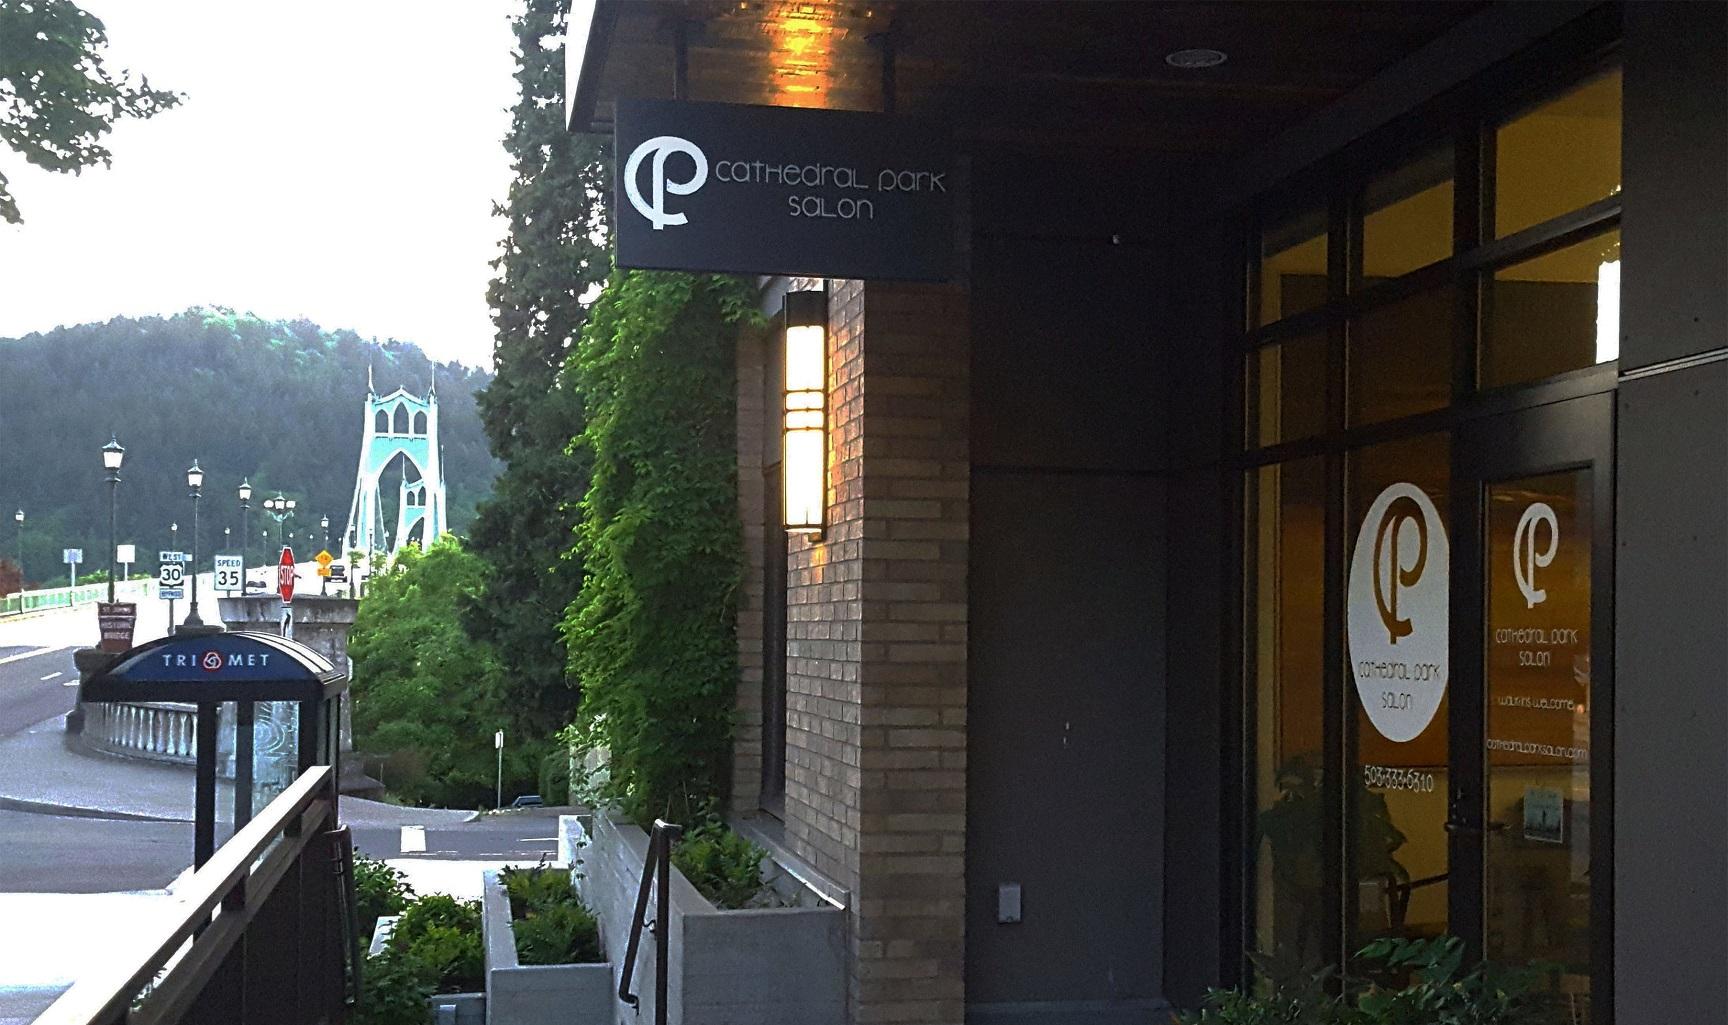 Cathedral Park Salon